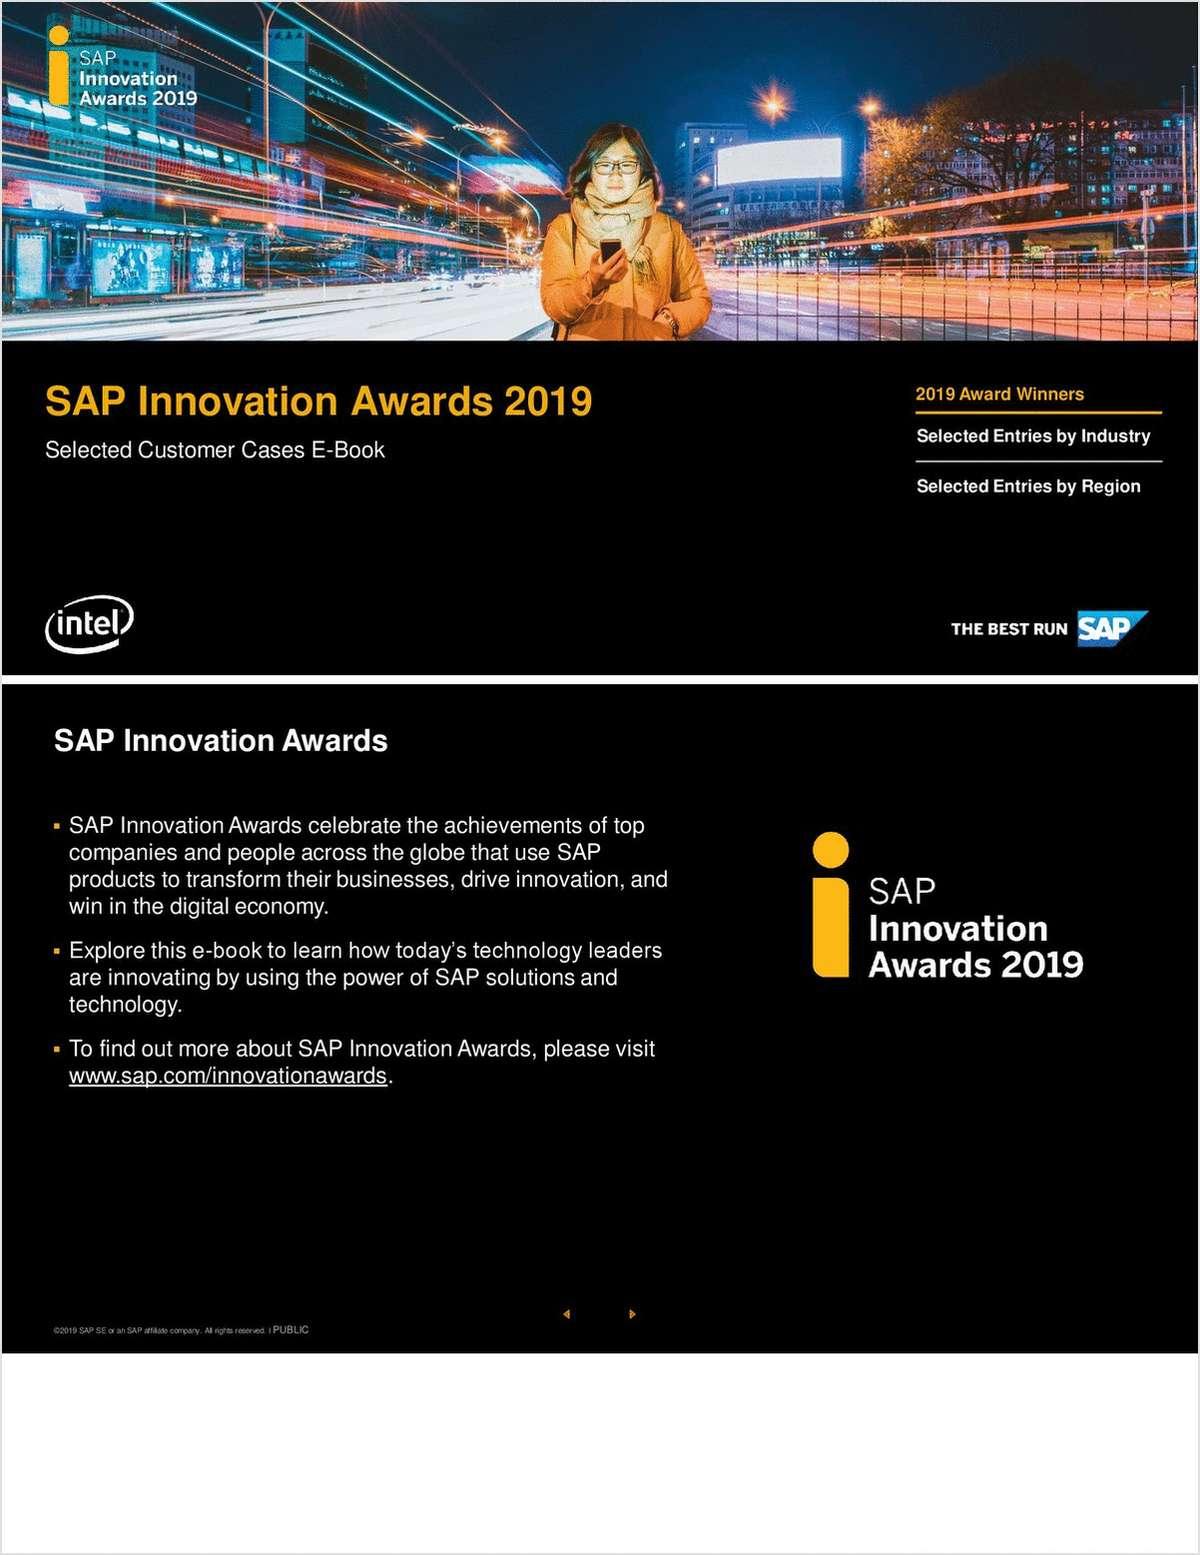 SAP Innovation Awards 2019